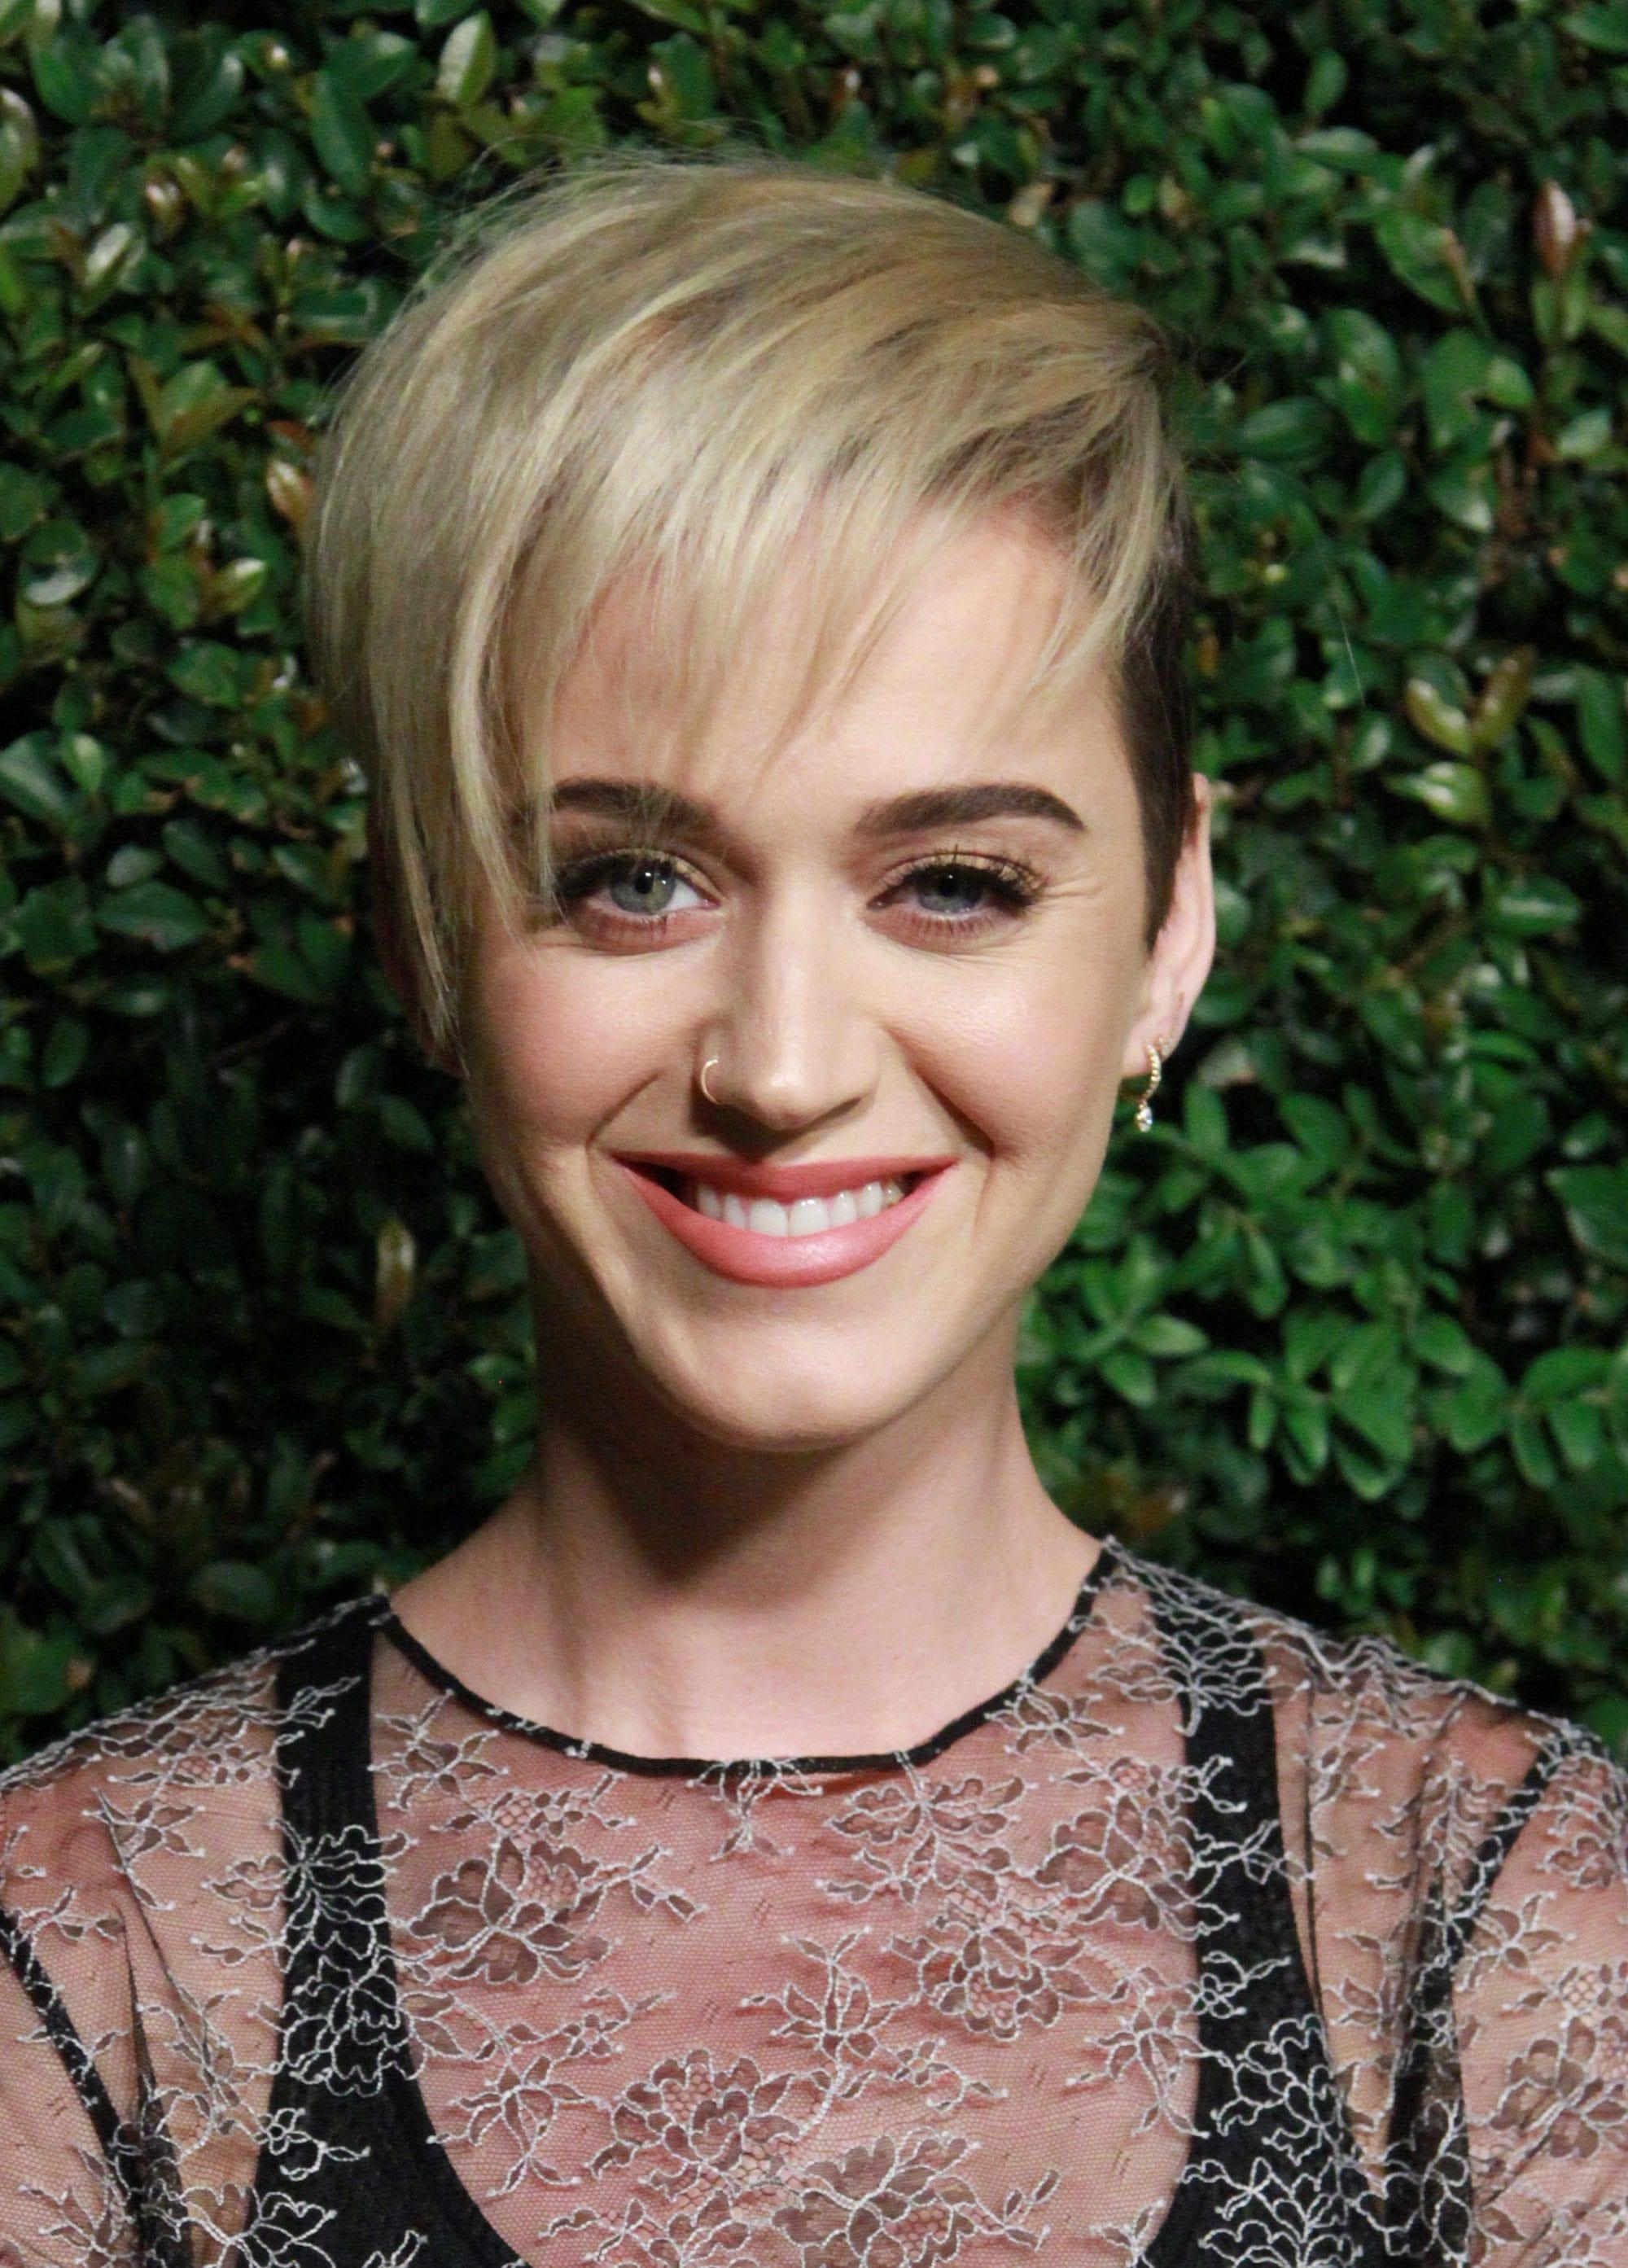 Katy Perry - long pixie cut with undercut - 2017 - Rex